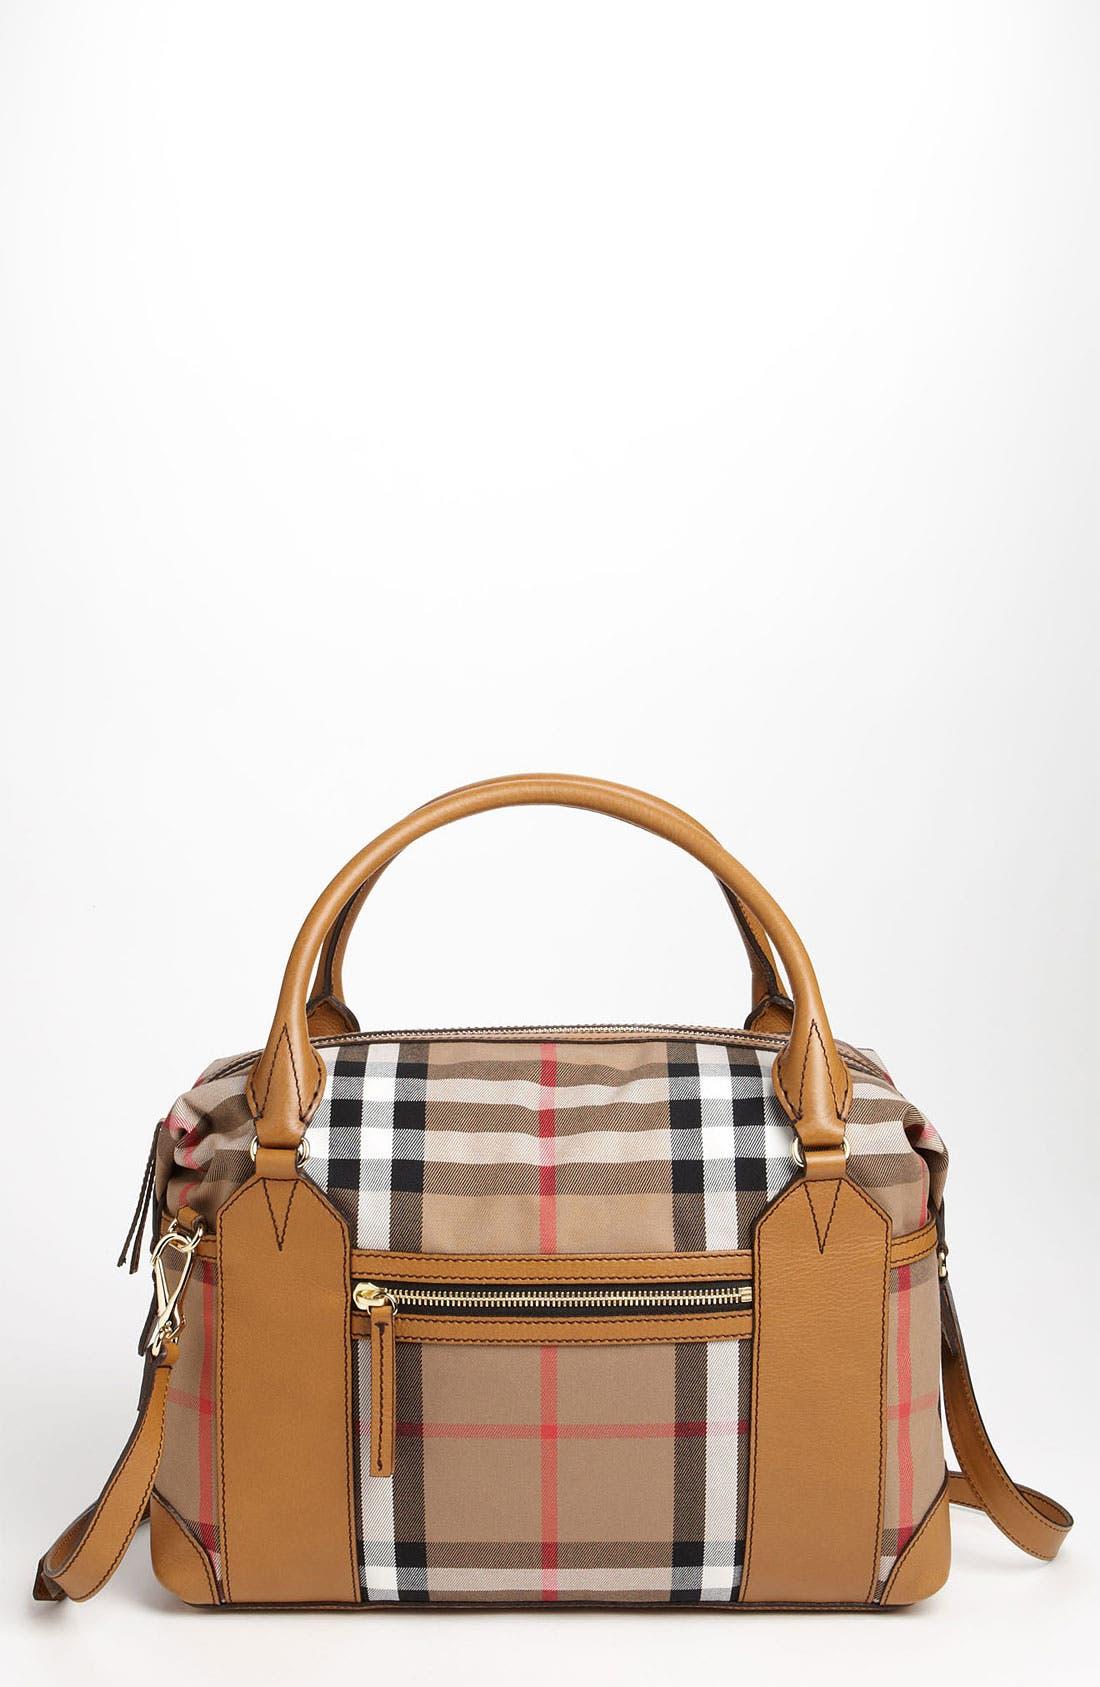 Alternate Image 1 Selected - Burberry 'House Check' Diaper Bag